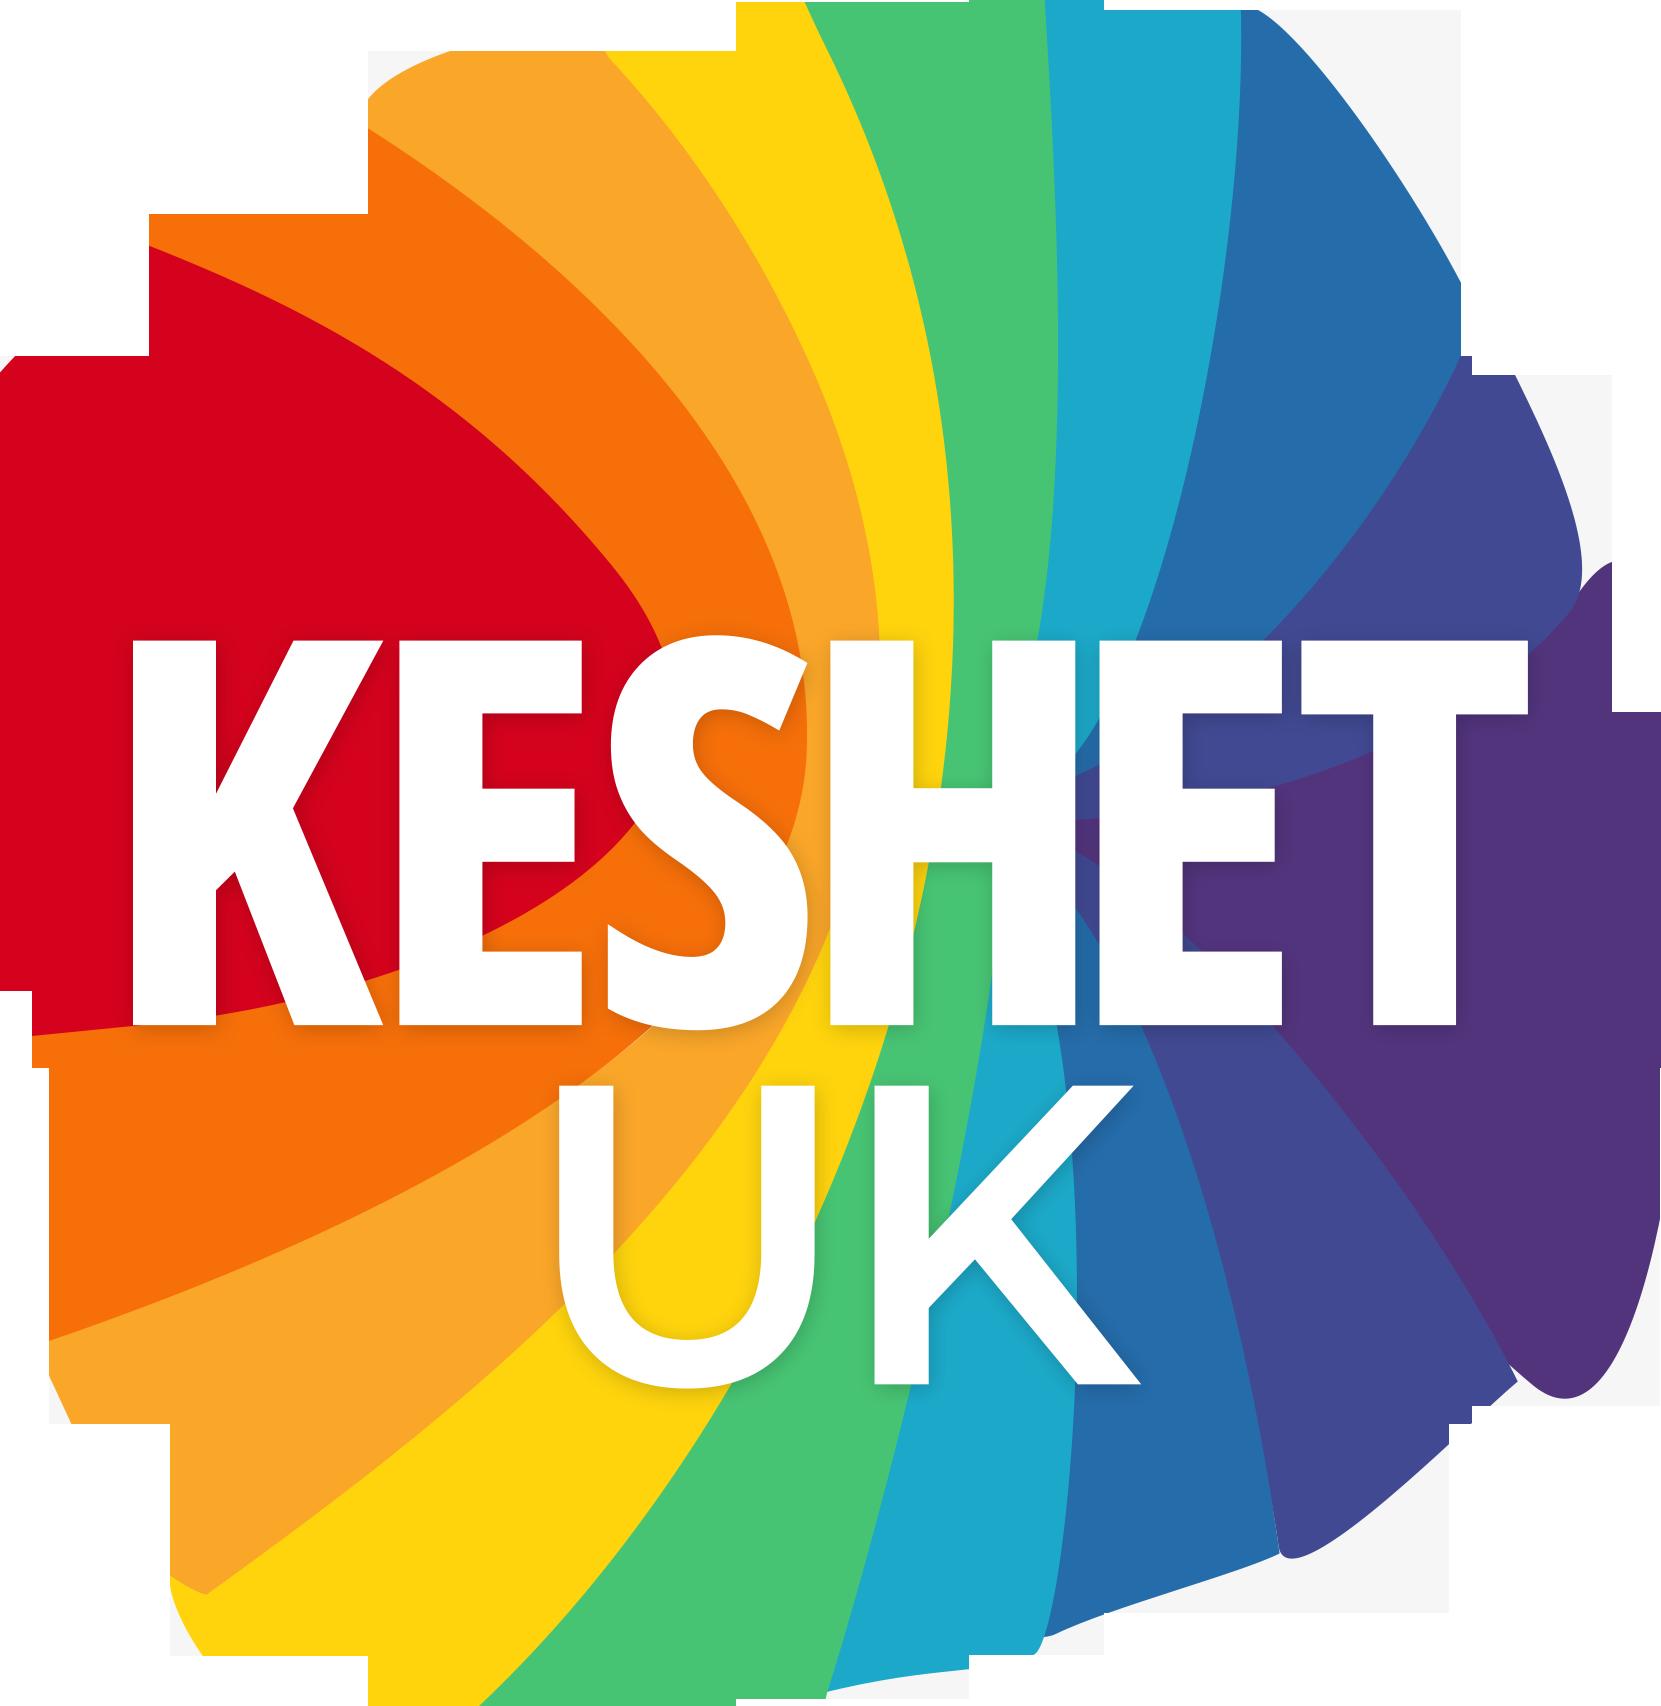 Keshet Productions